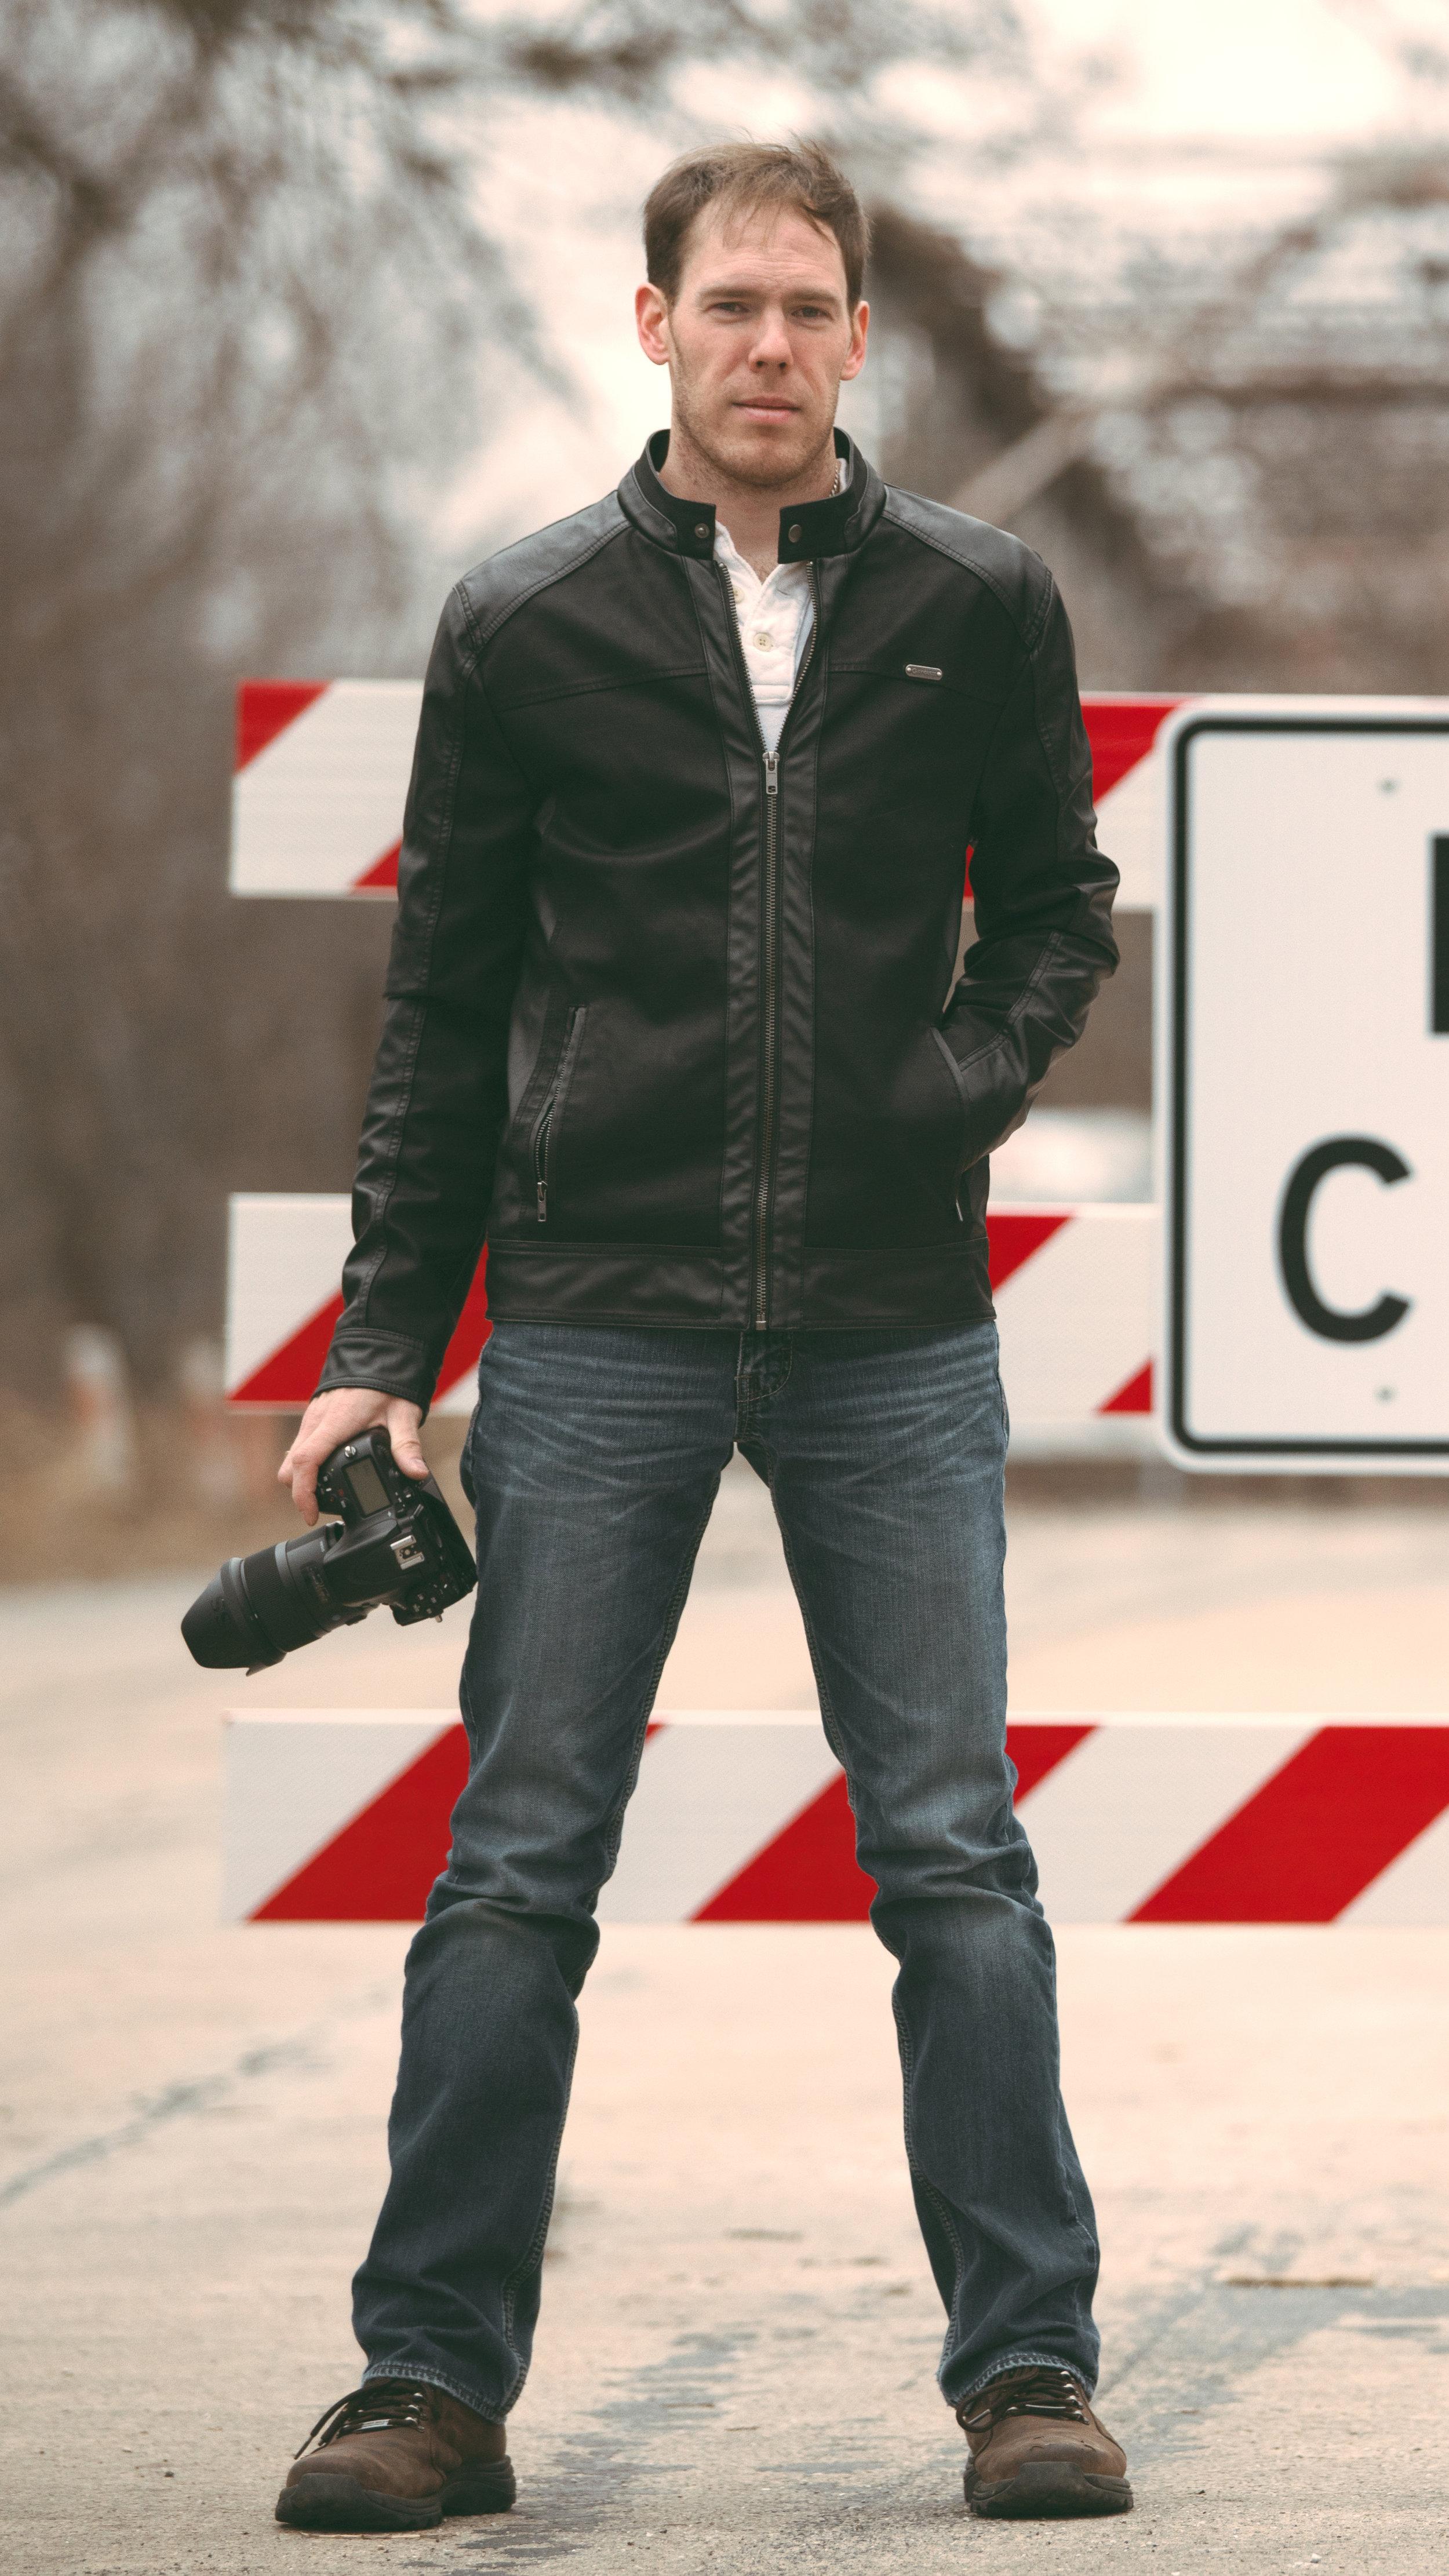 Tyler-Profile-Photographer(16_9-Thumbnail).jpg